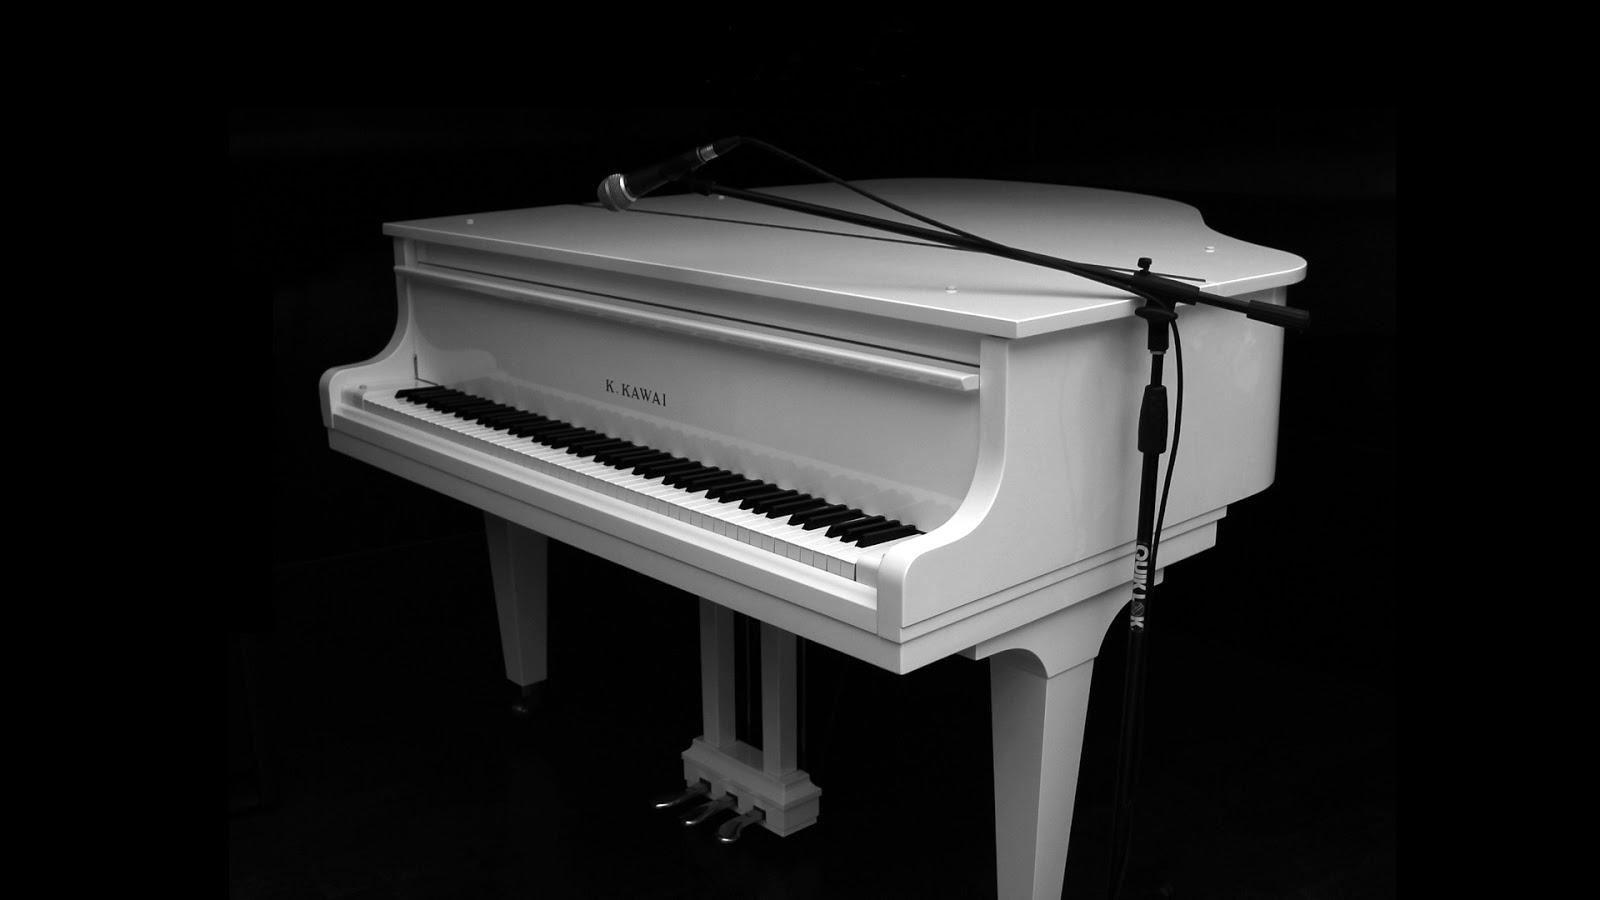 http://1.bp.blogspot.com/-Ki1Bzlx3Cd4/UILMaCoRWHI/AAAAAAAAHTI/0yTfepzM4Rc/s1600/zwarte-achtergrond-met-een-witte-piano.jpg